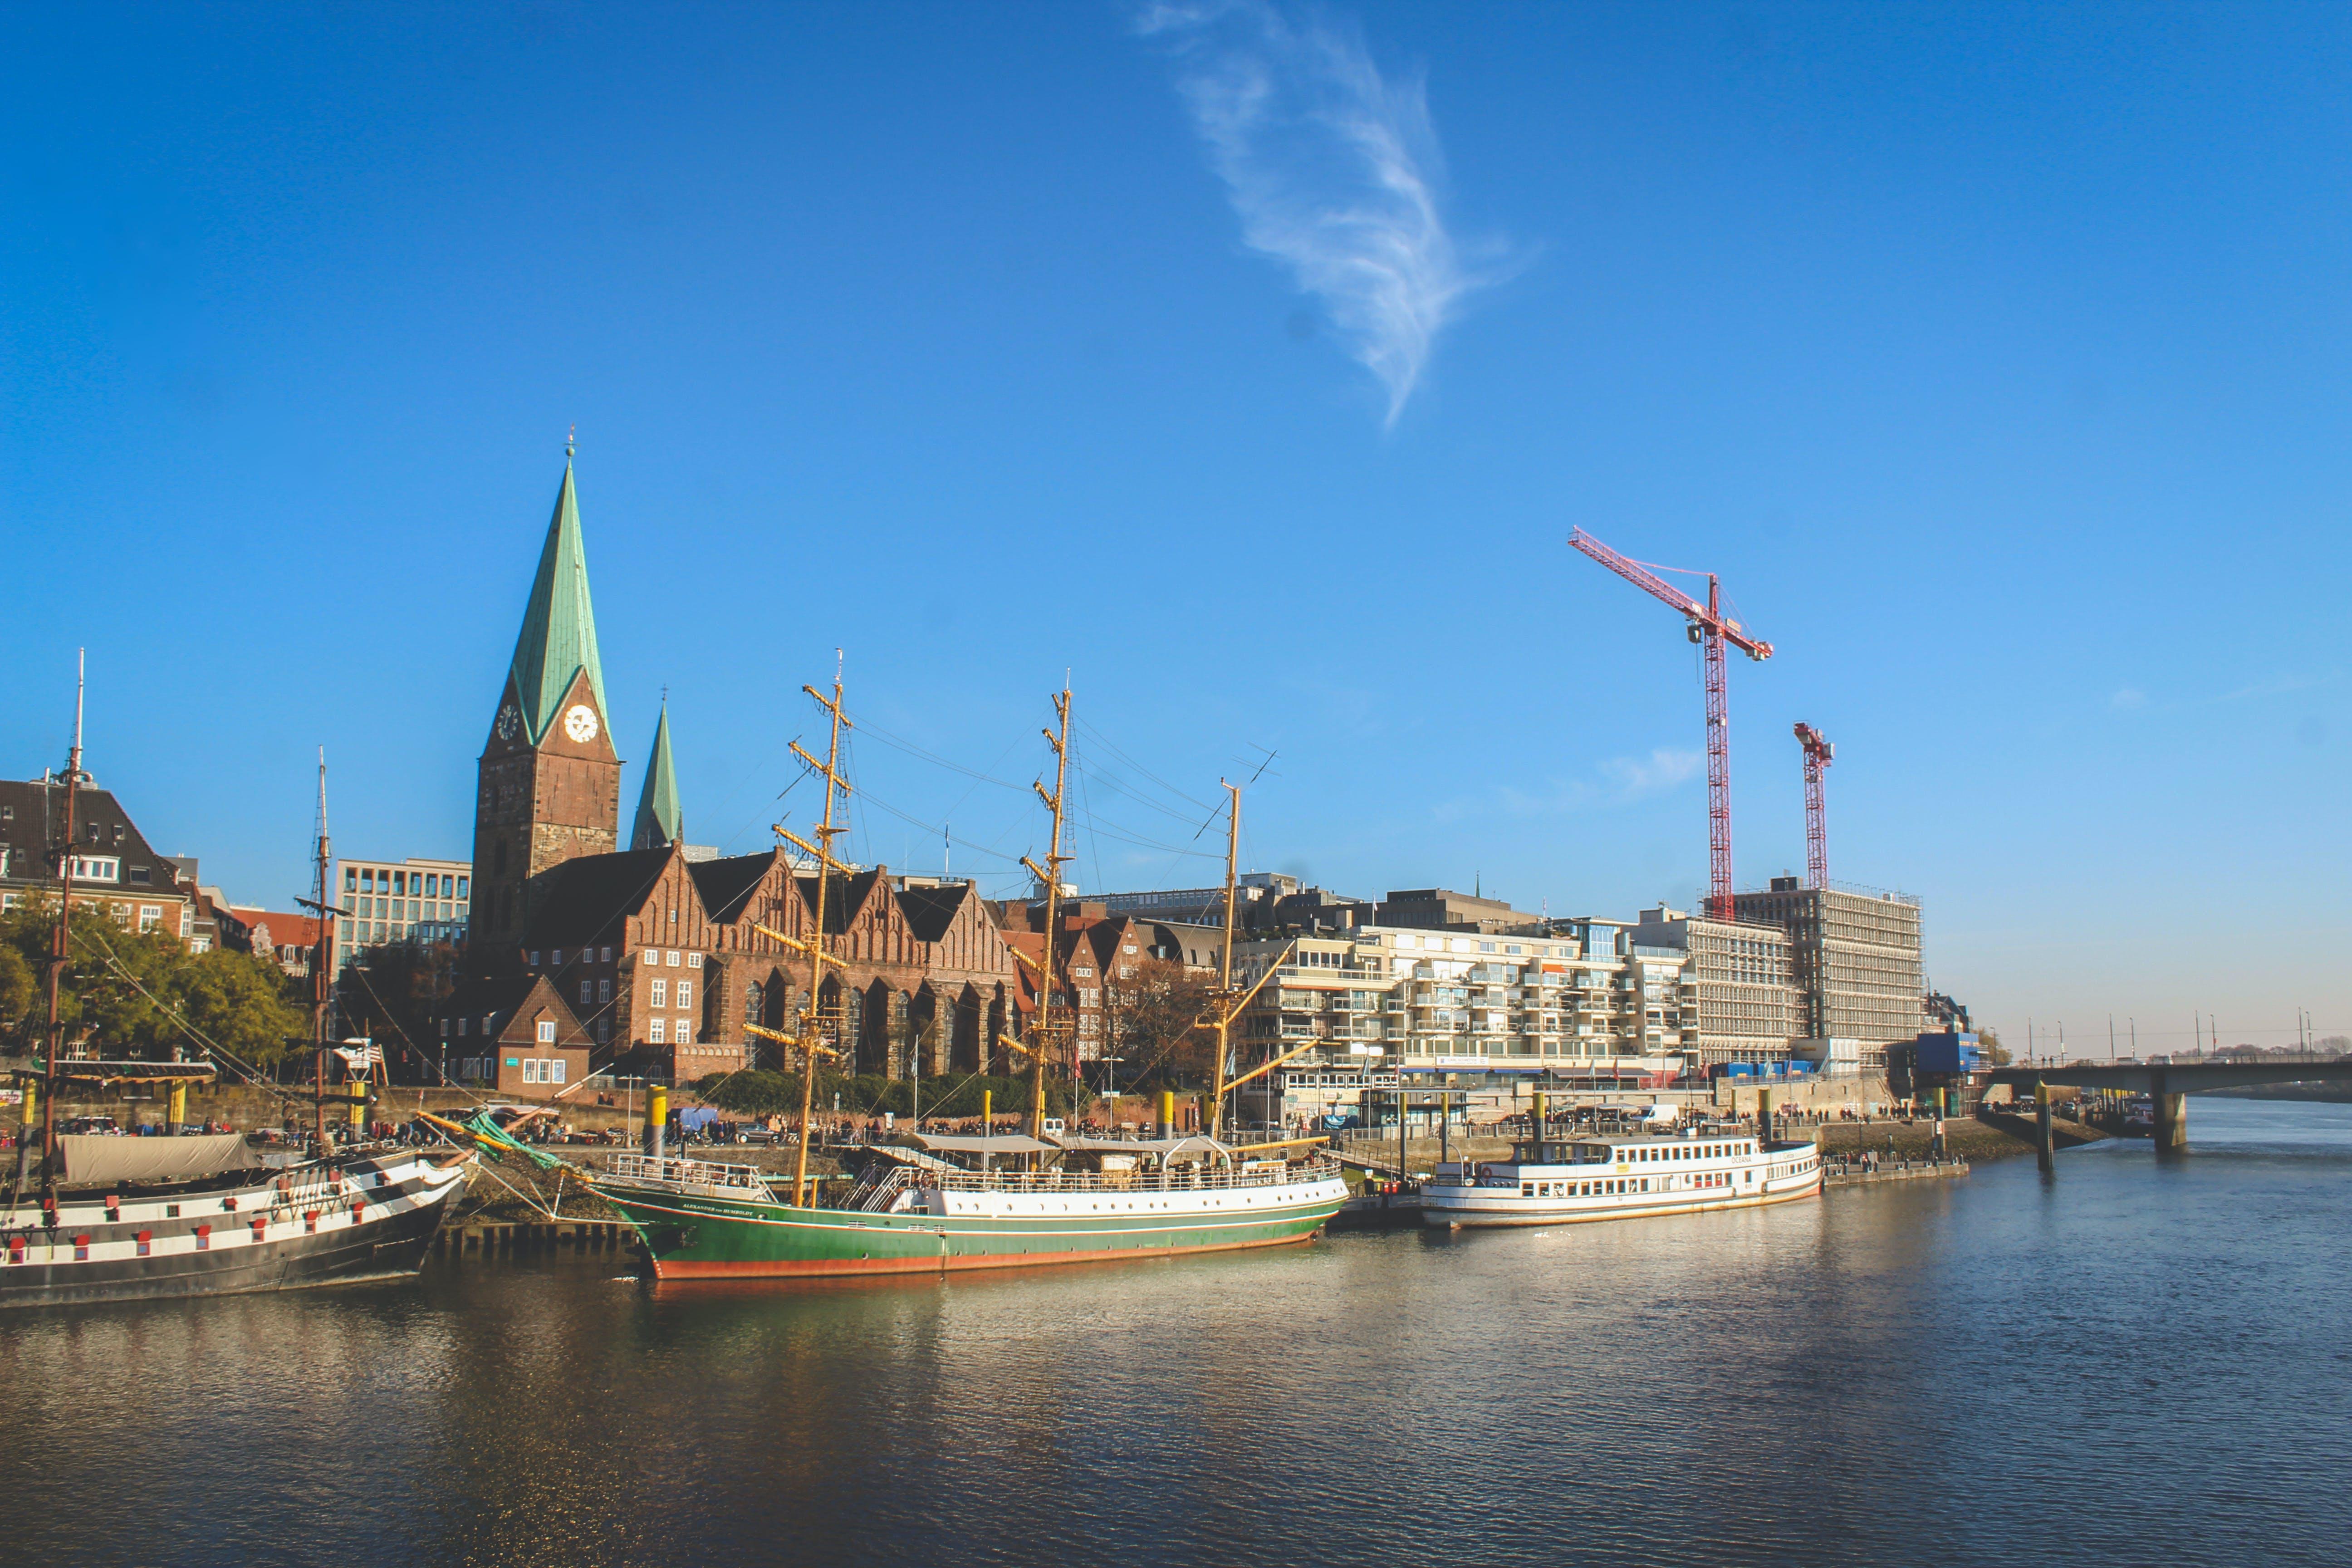 Kostenloses Stock Foto zu android wallpaper, big city, blue sky, church